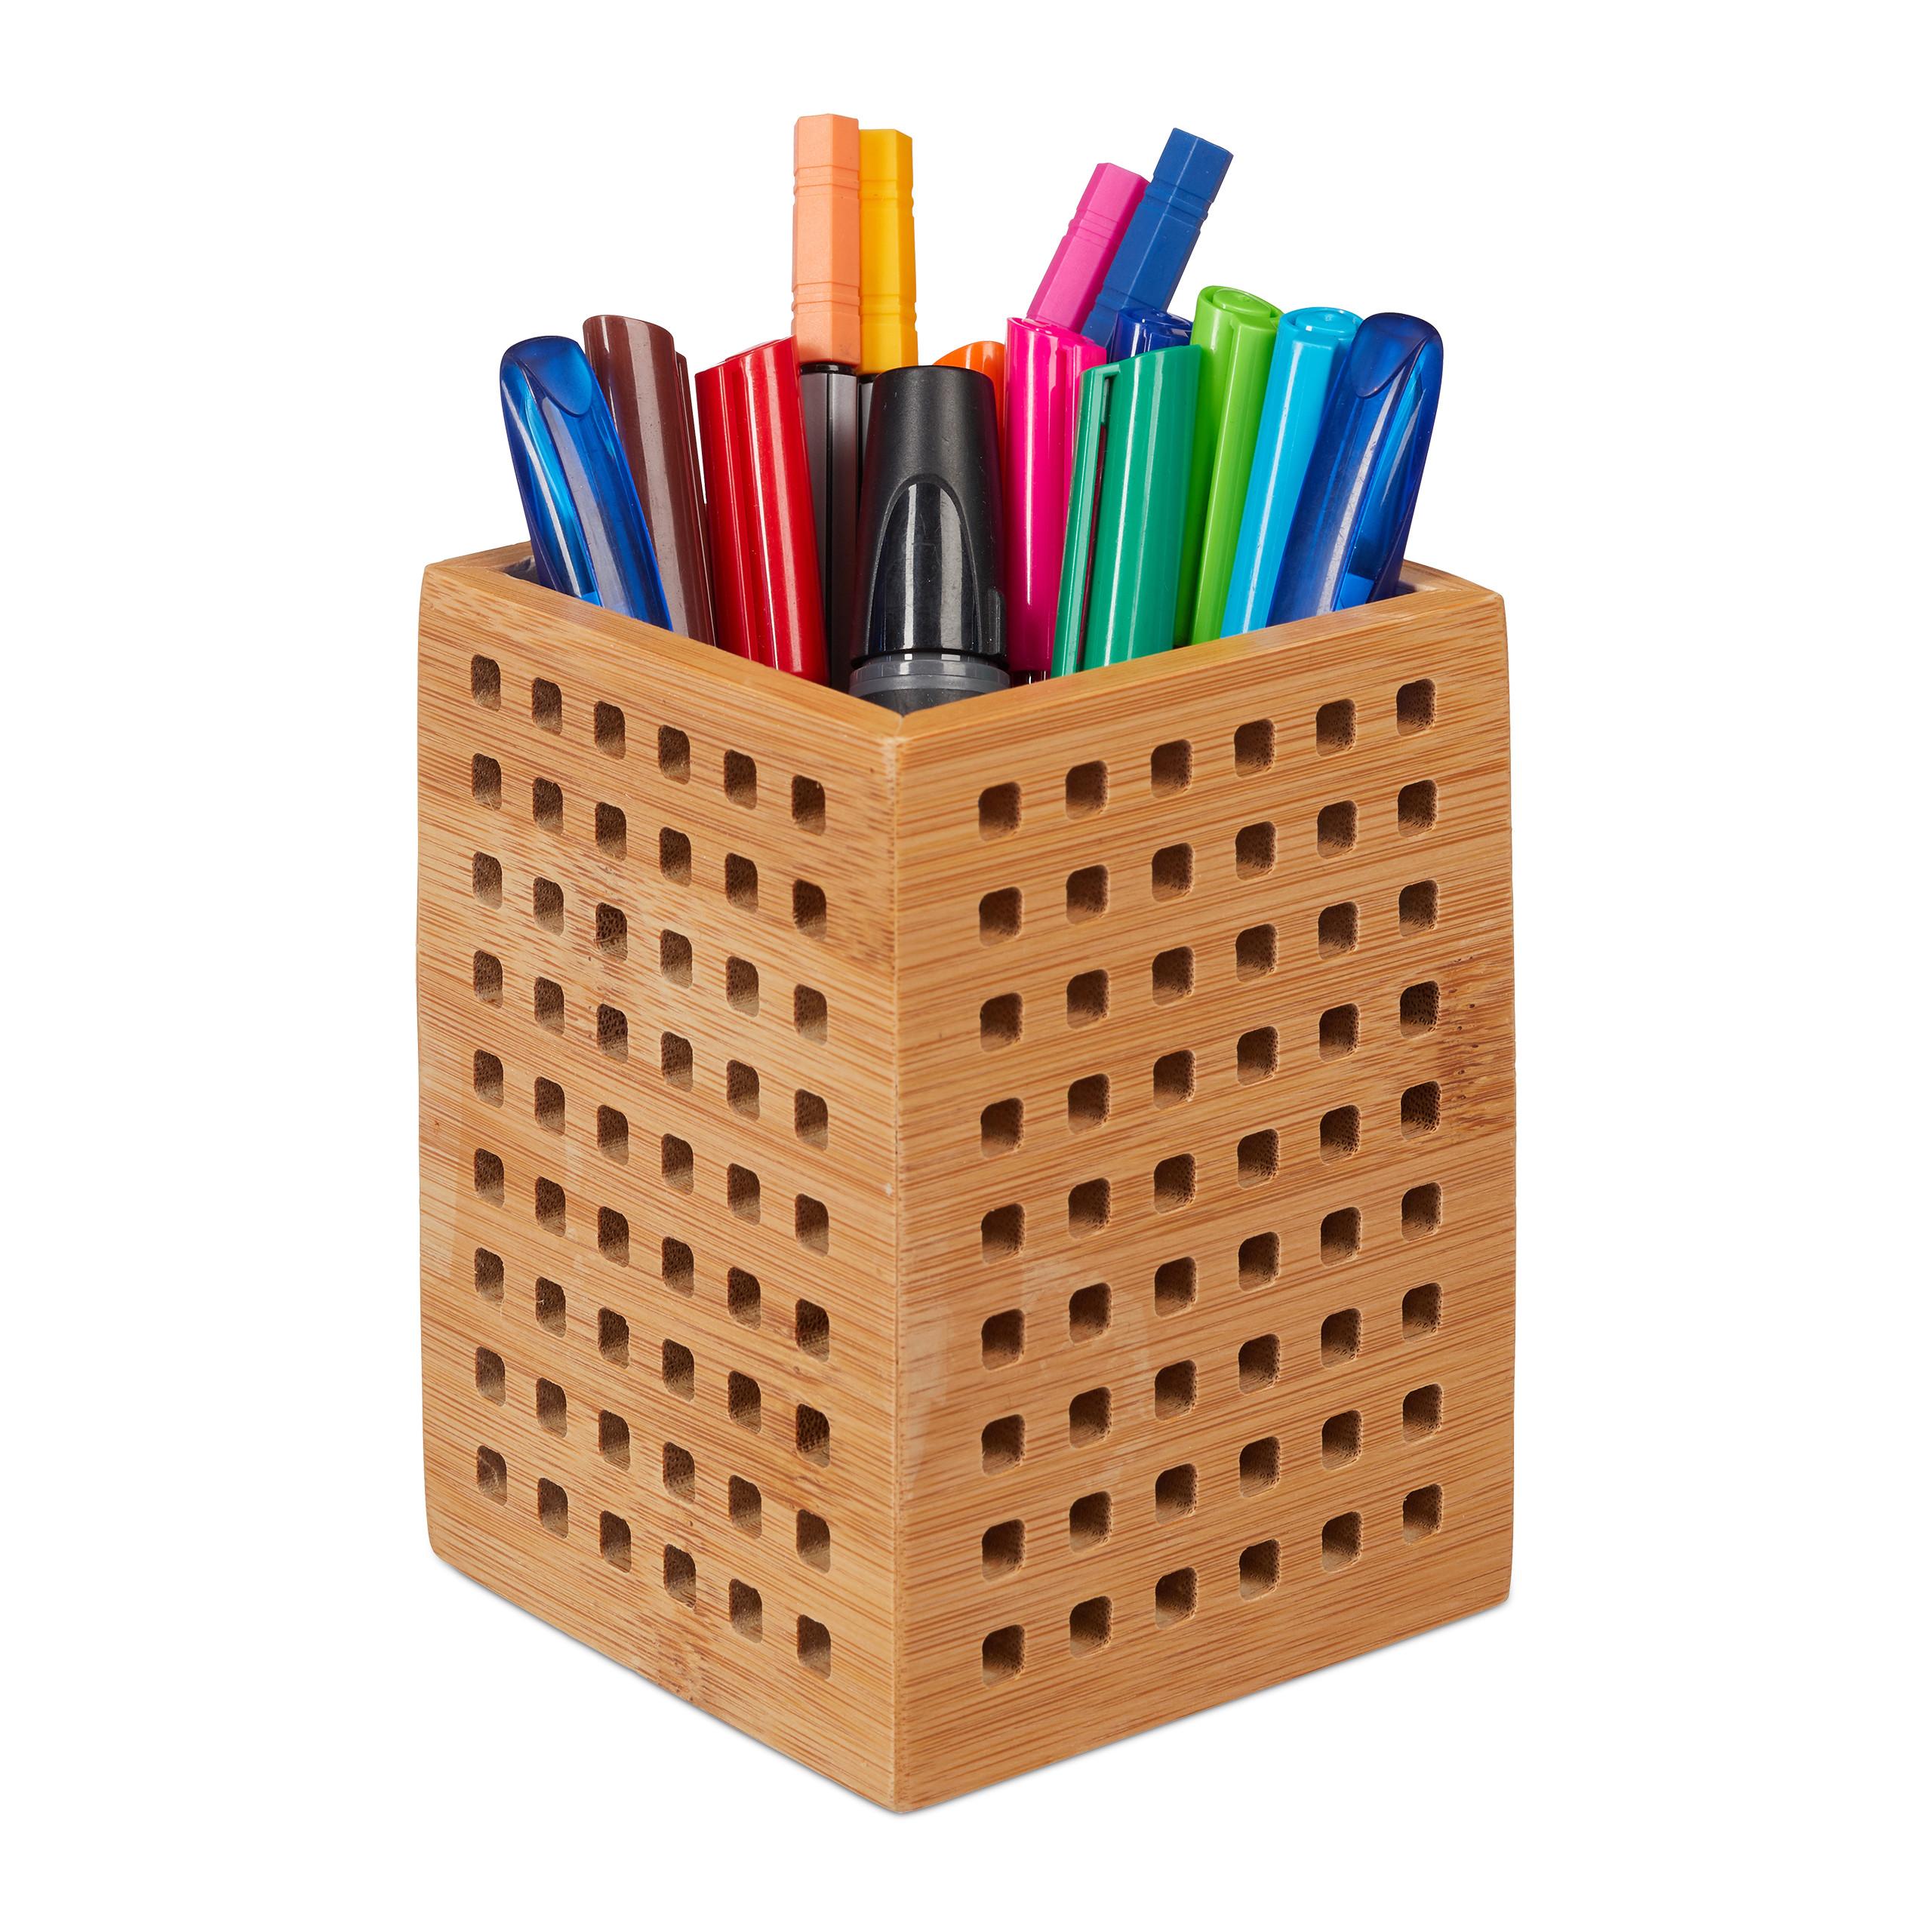 Stiftköcher Stiftehalter Bambus Stiftebox Stiftebecher Holz Utensilienbox Büro